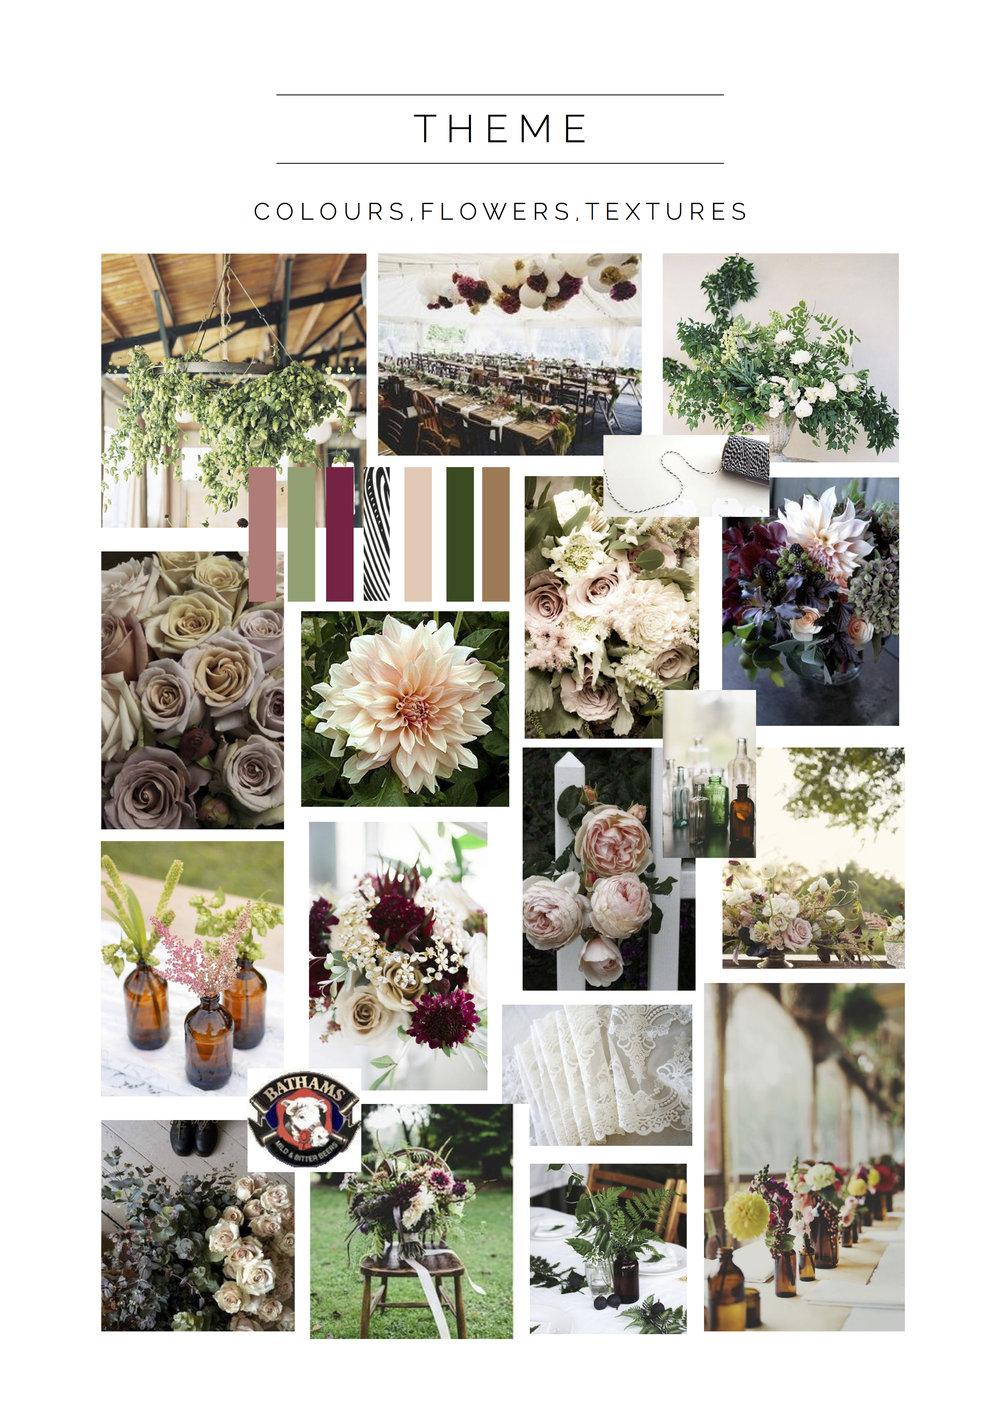 WEDDING FLOWERS BY JESSICA CHARLOTTE SIMMONDS Cambridge florist